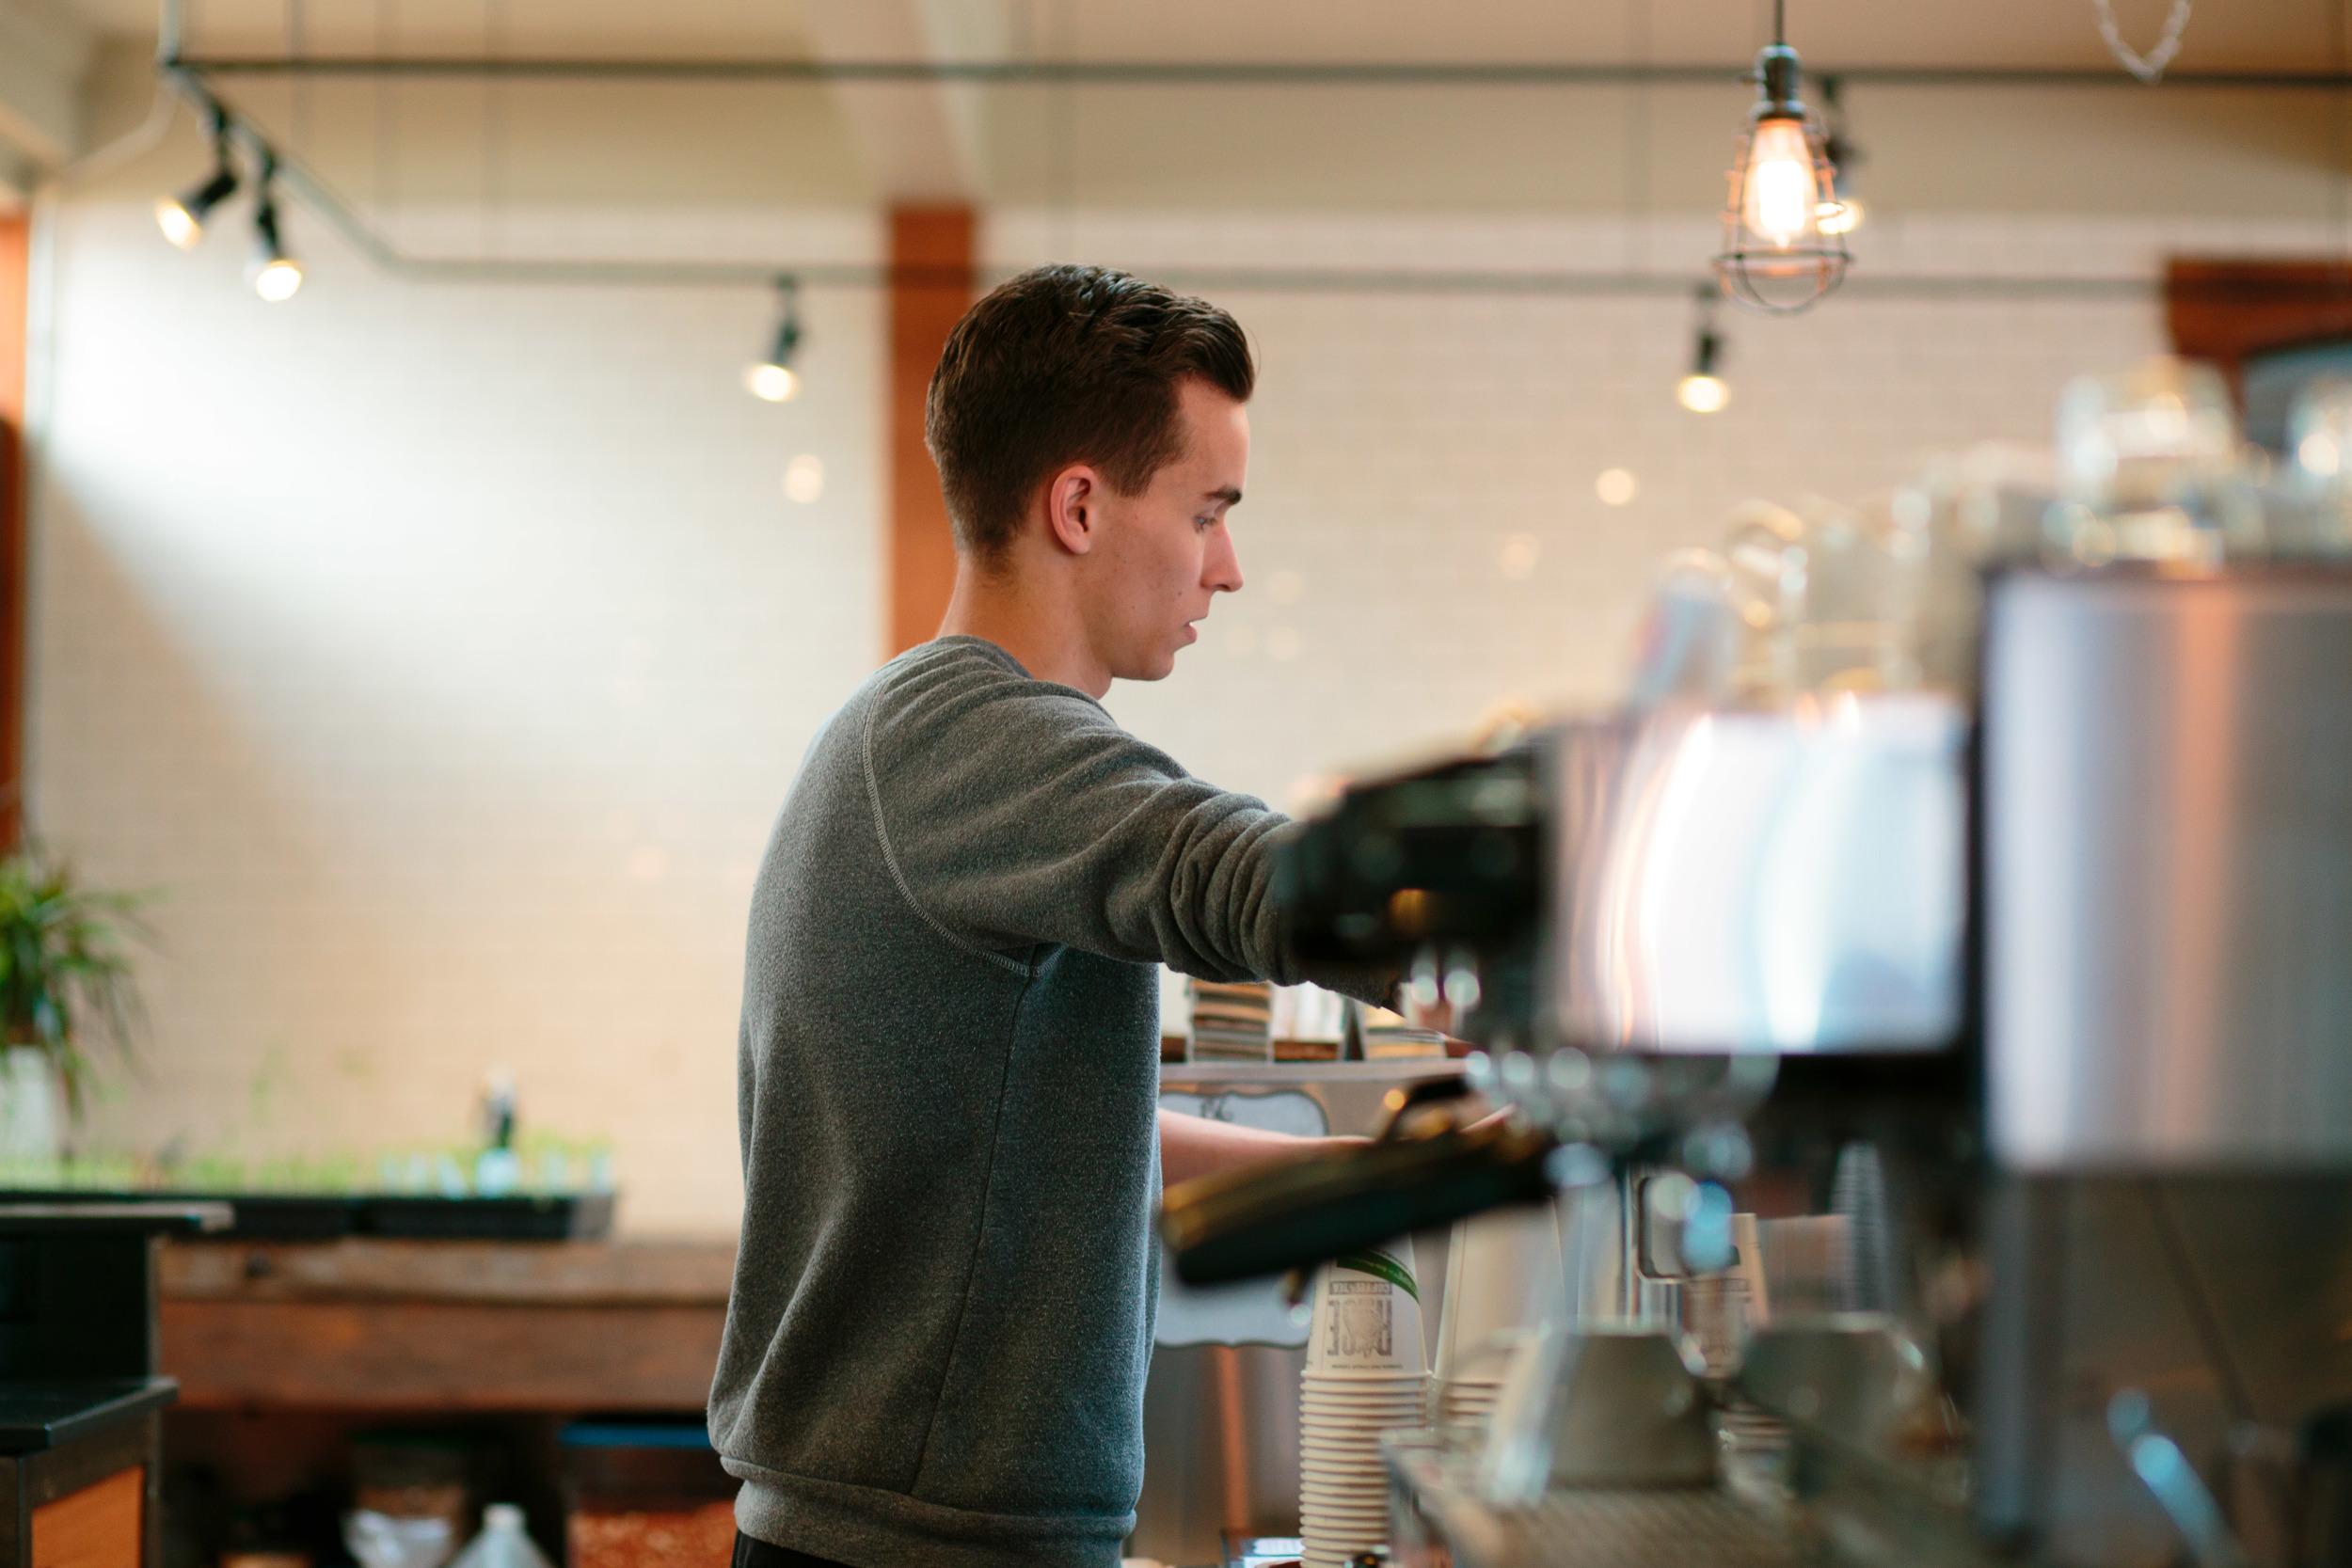 Barista behind espresso bar shop local coffee